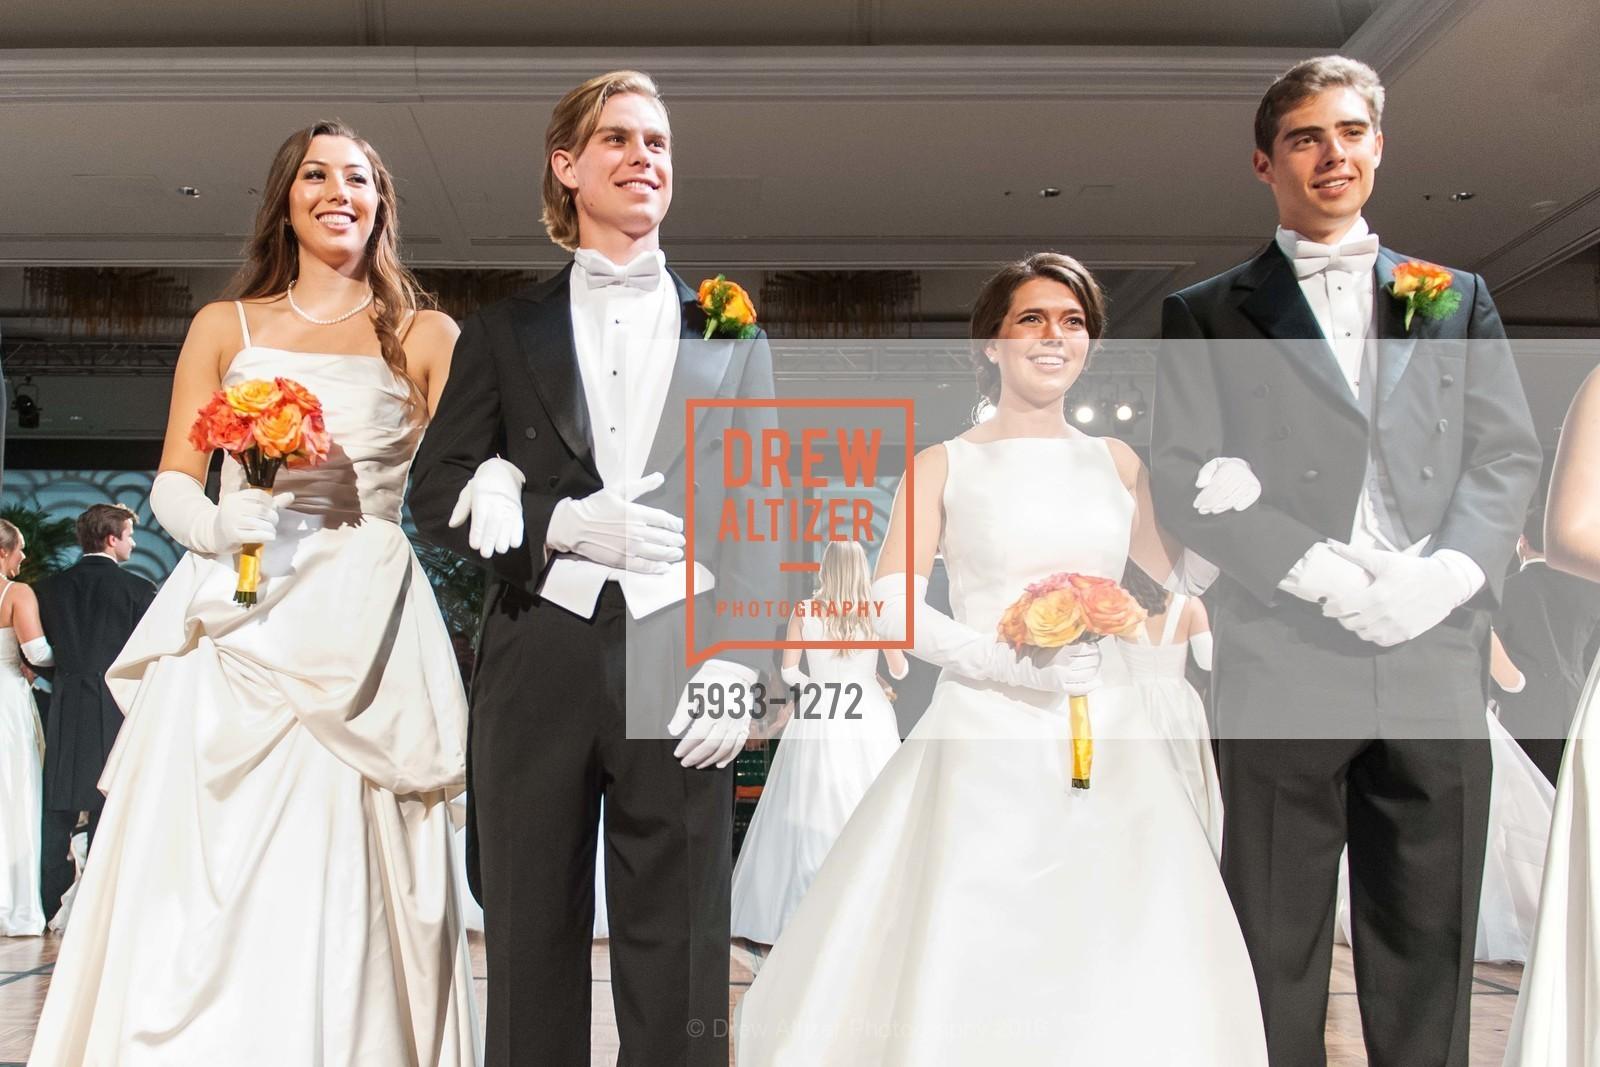 Mara Therese Sylvia, Ben Dierkhising, Ashley Baxter, Benjamin Cohen, Photo #5933-1272